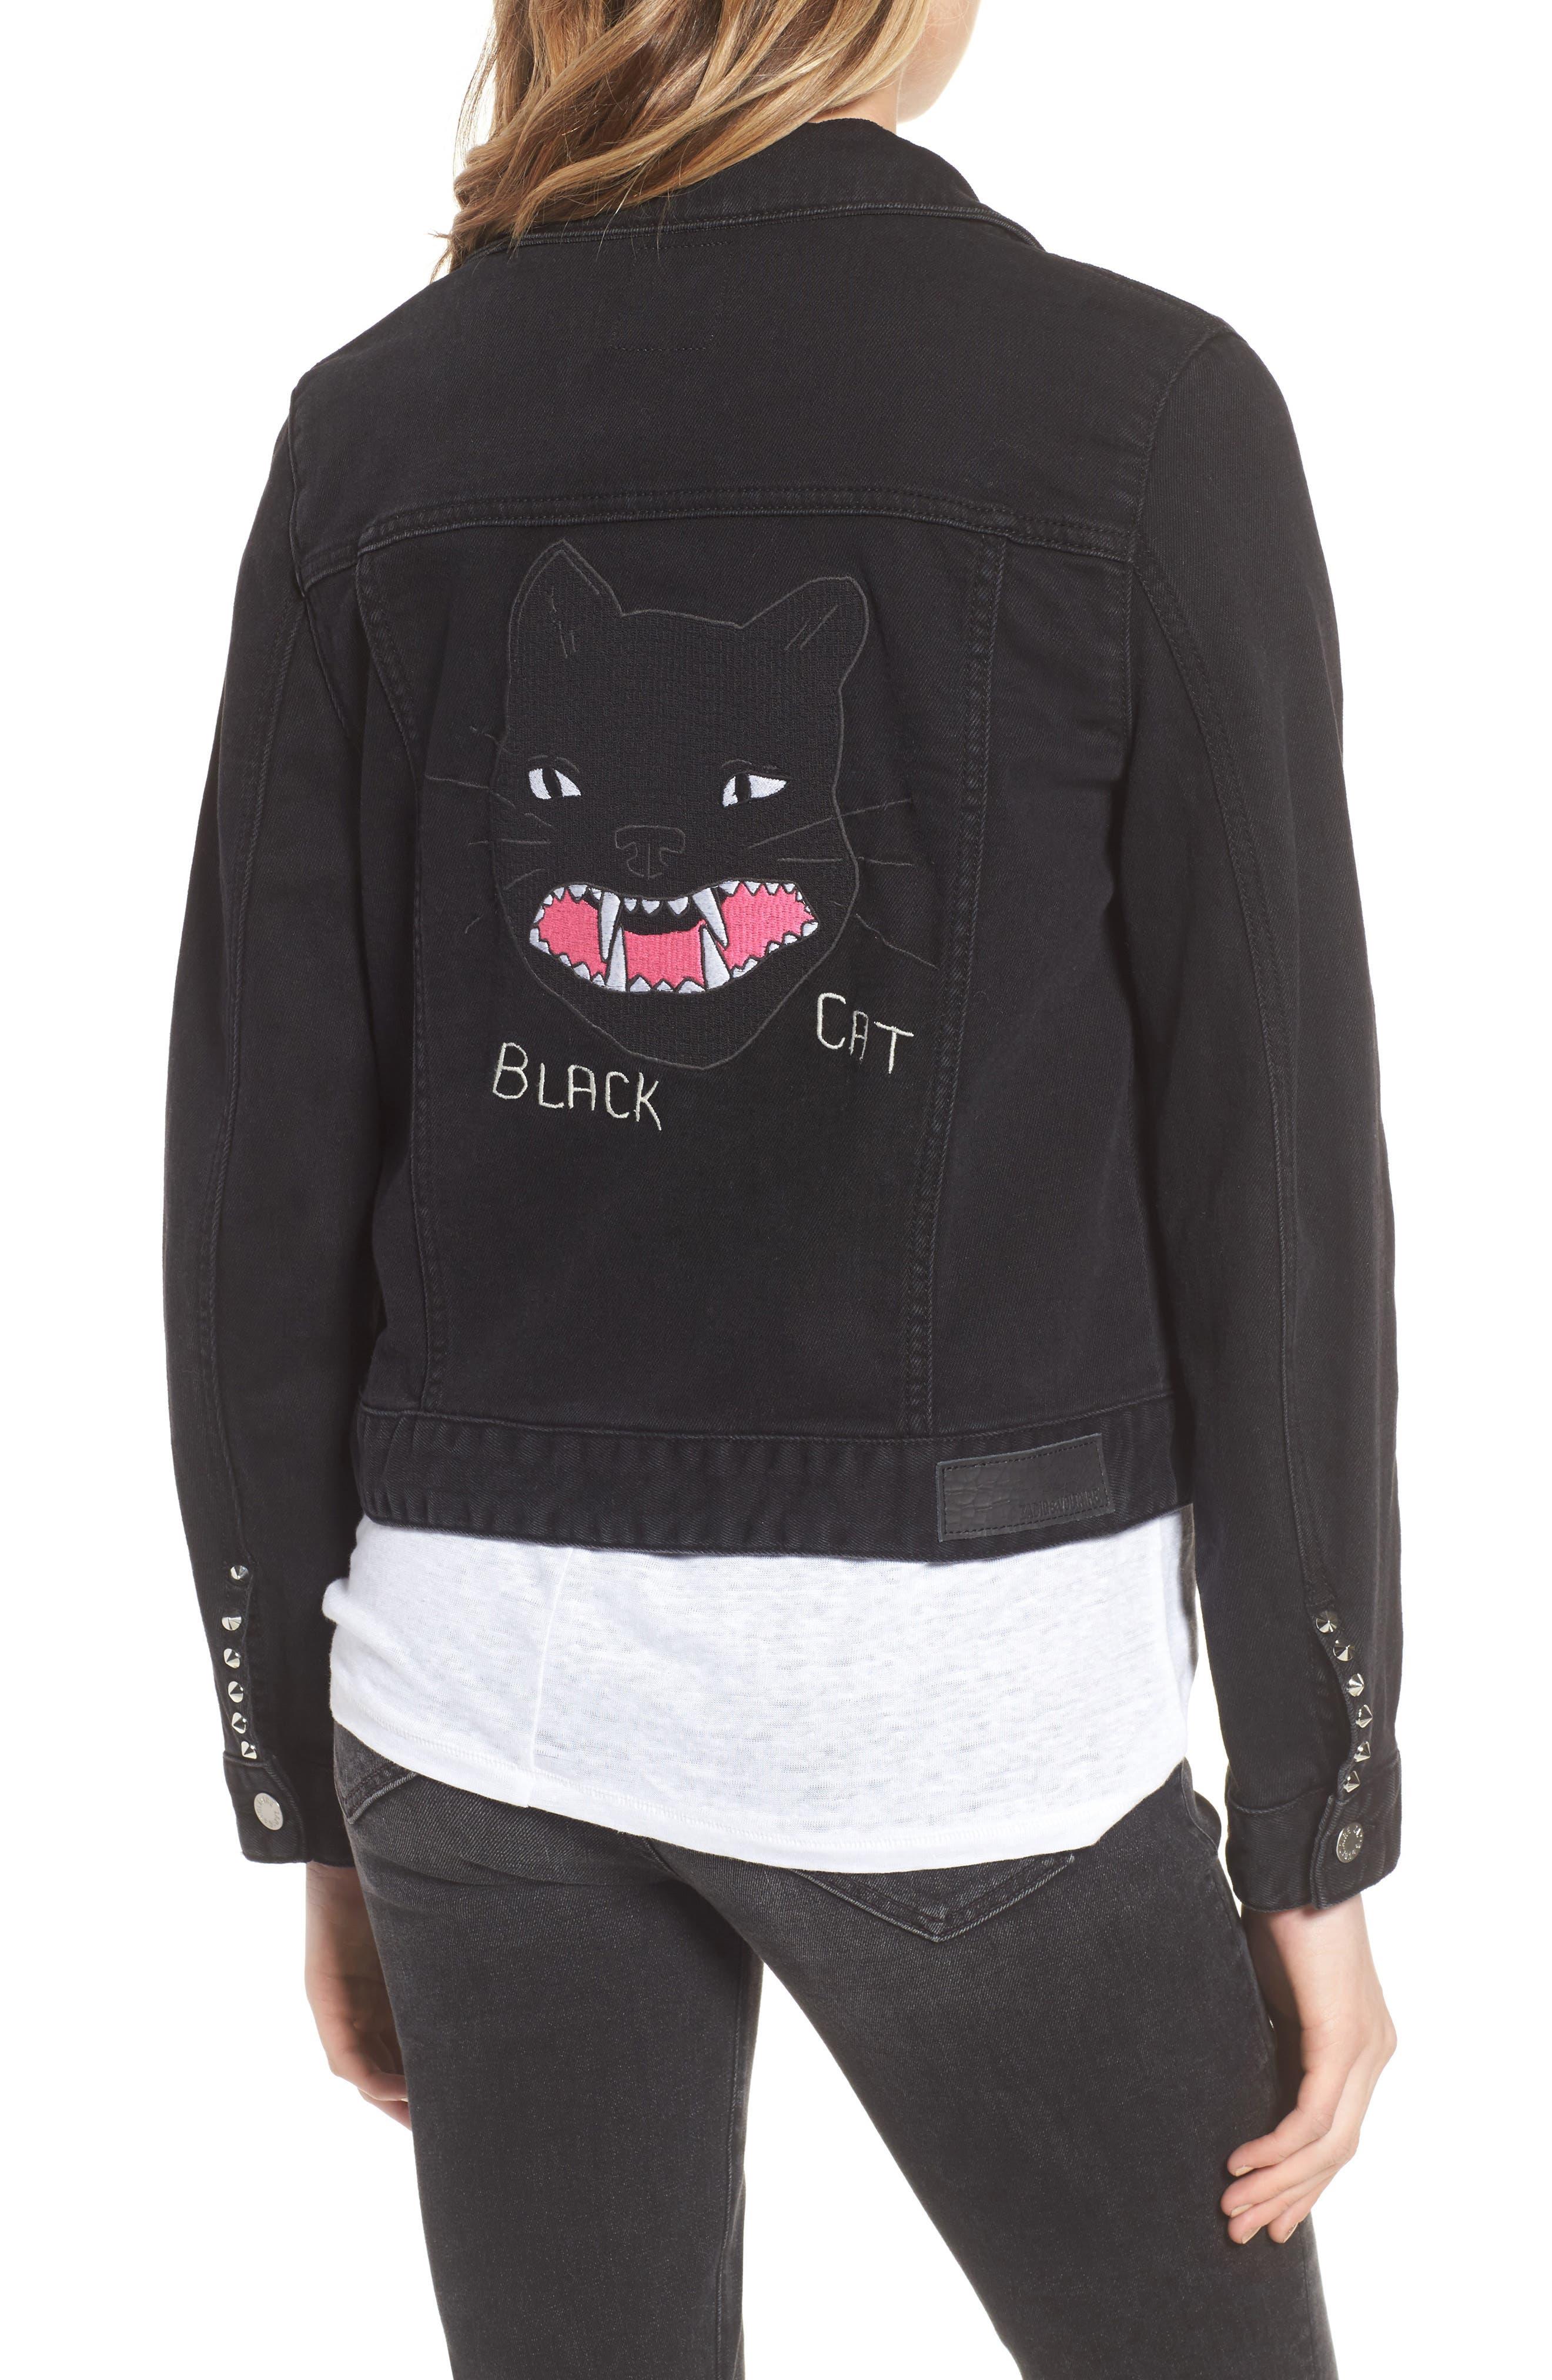 Kioko Cat Jacket,                             Alternate thumbnail 2, color,                             001